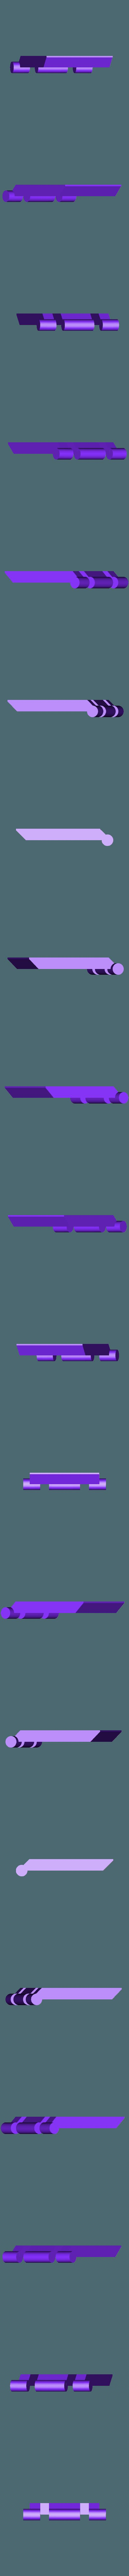 Keyboard Clip v1.stl Download free STL file Keyboard Clip • 3D printer model, DadsDiy